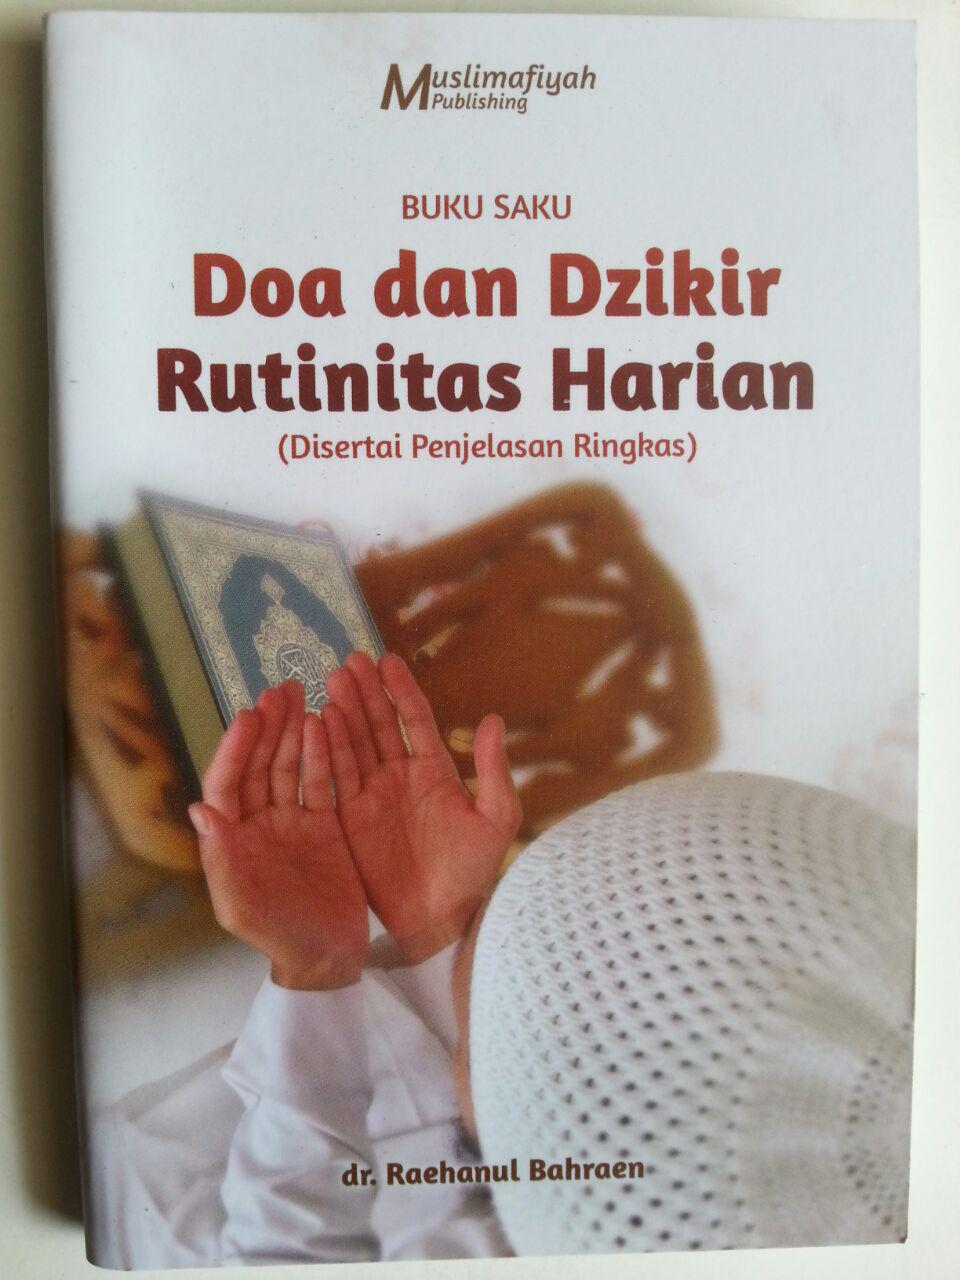 Buku Saku Doa Dan Dzikir Rutinitas Harian Disertai Penjelasan Ringkas cover 2